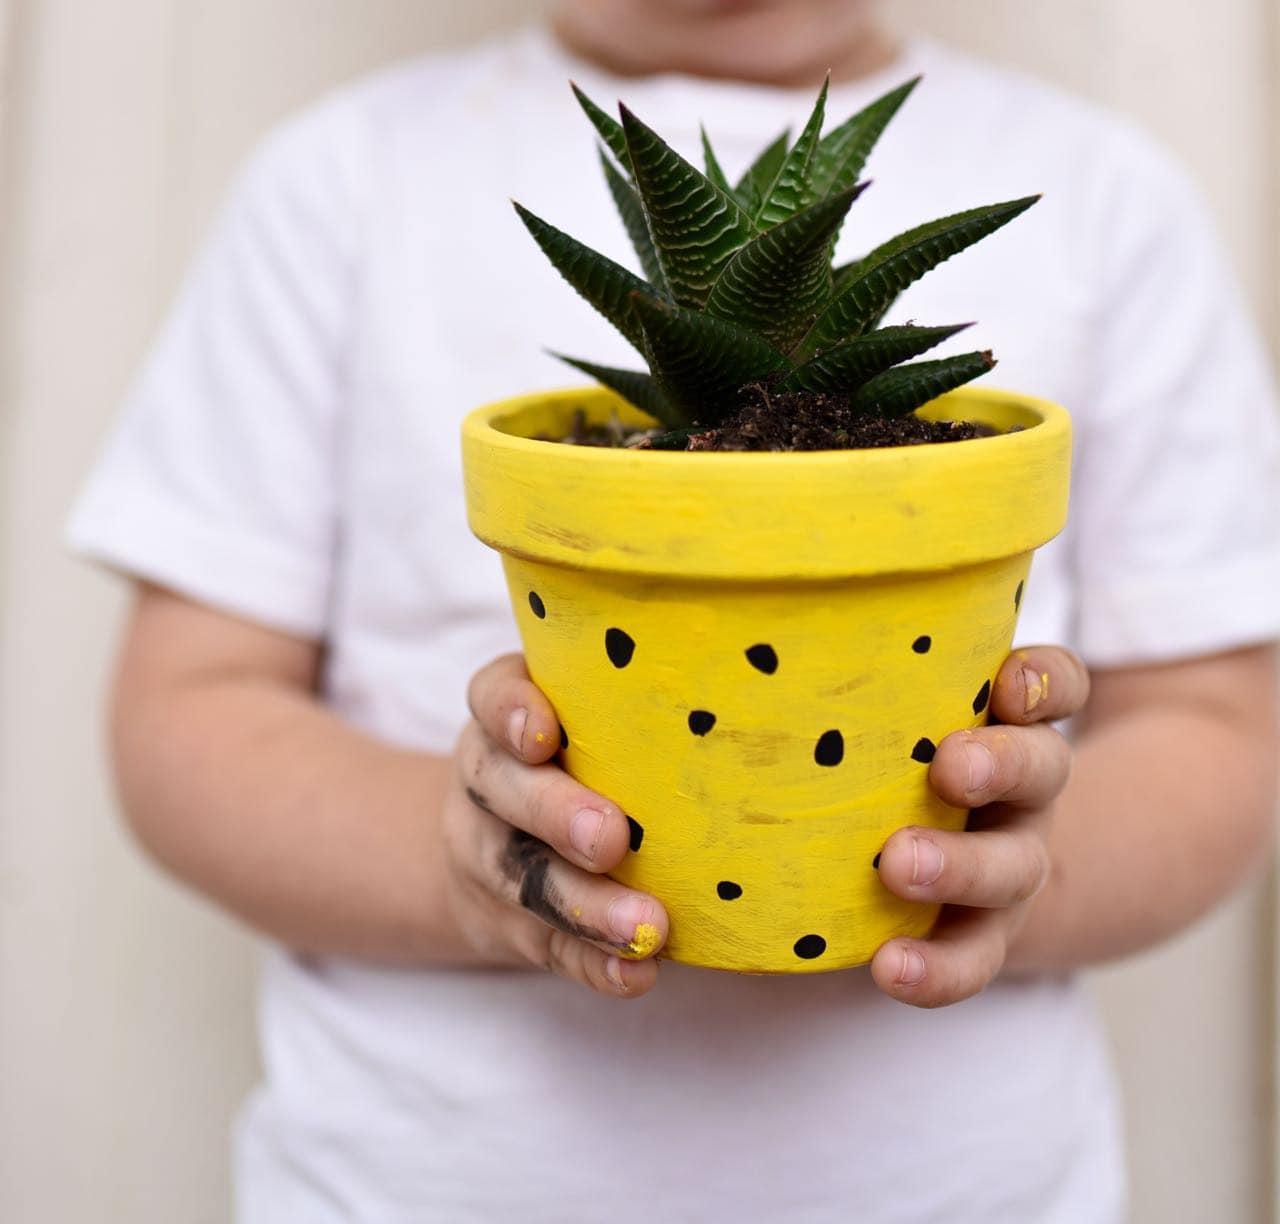 DIY Pineapple Planter Craft for Kids